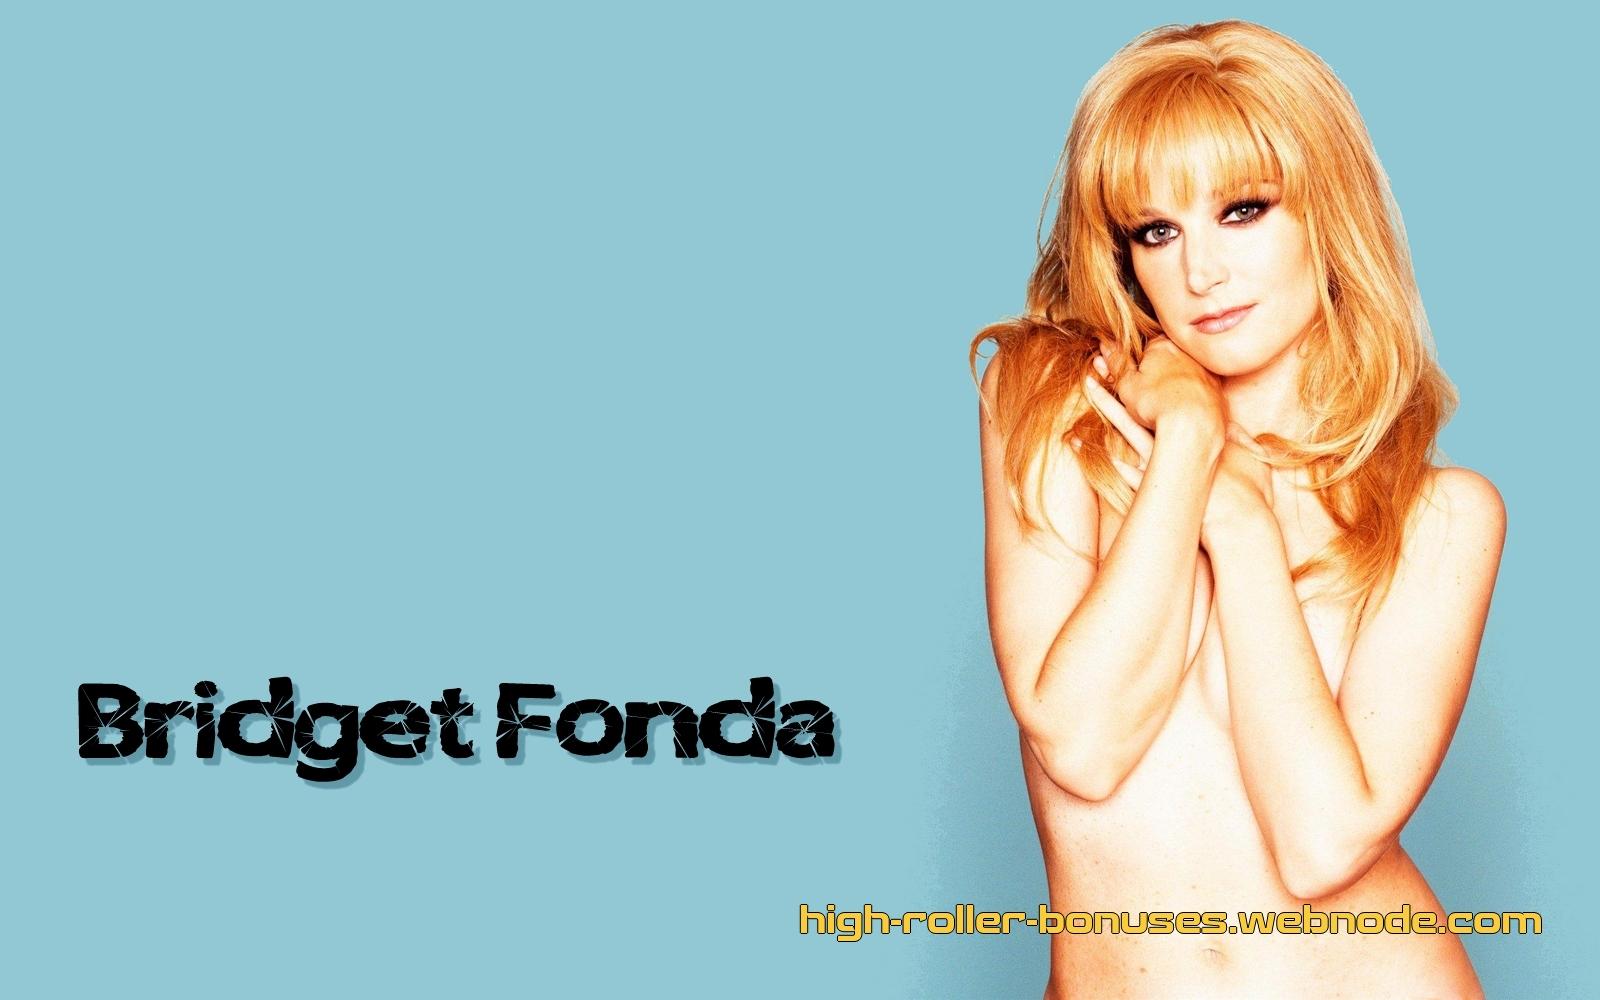 Nackt Bilder : Bridget Fonda Nude Pictures   nackter arsch.com